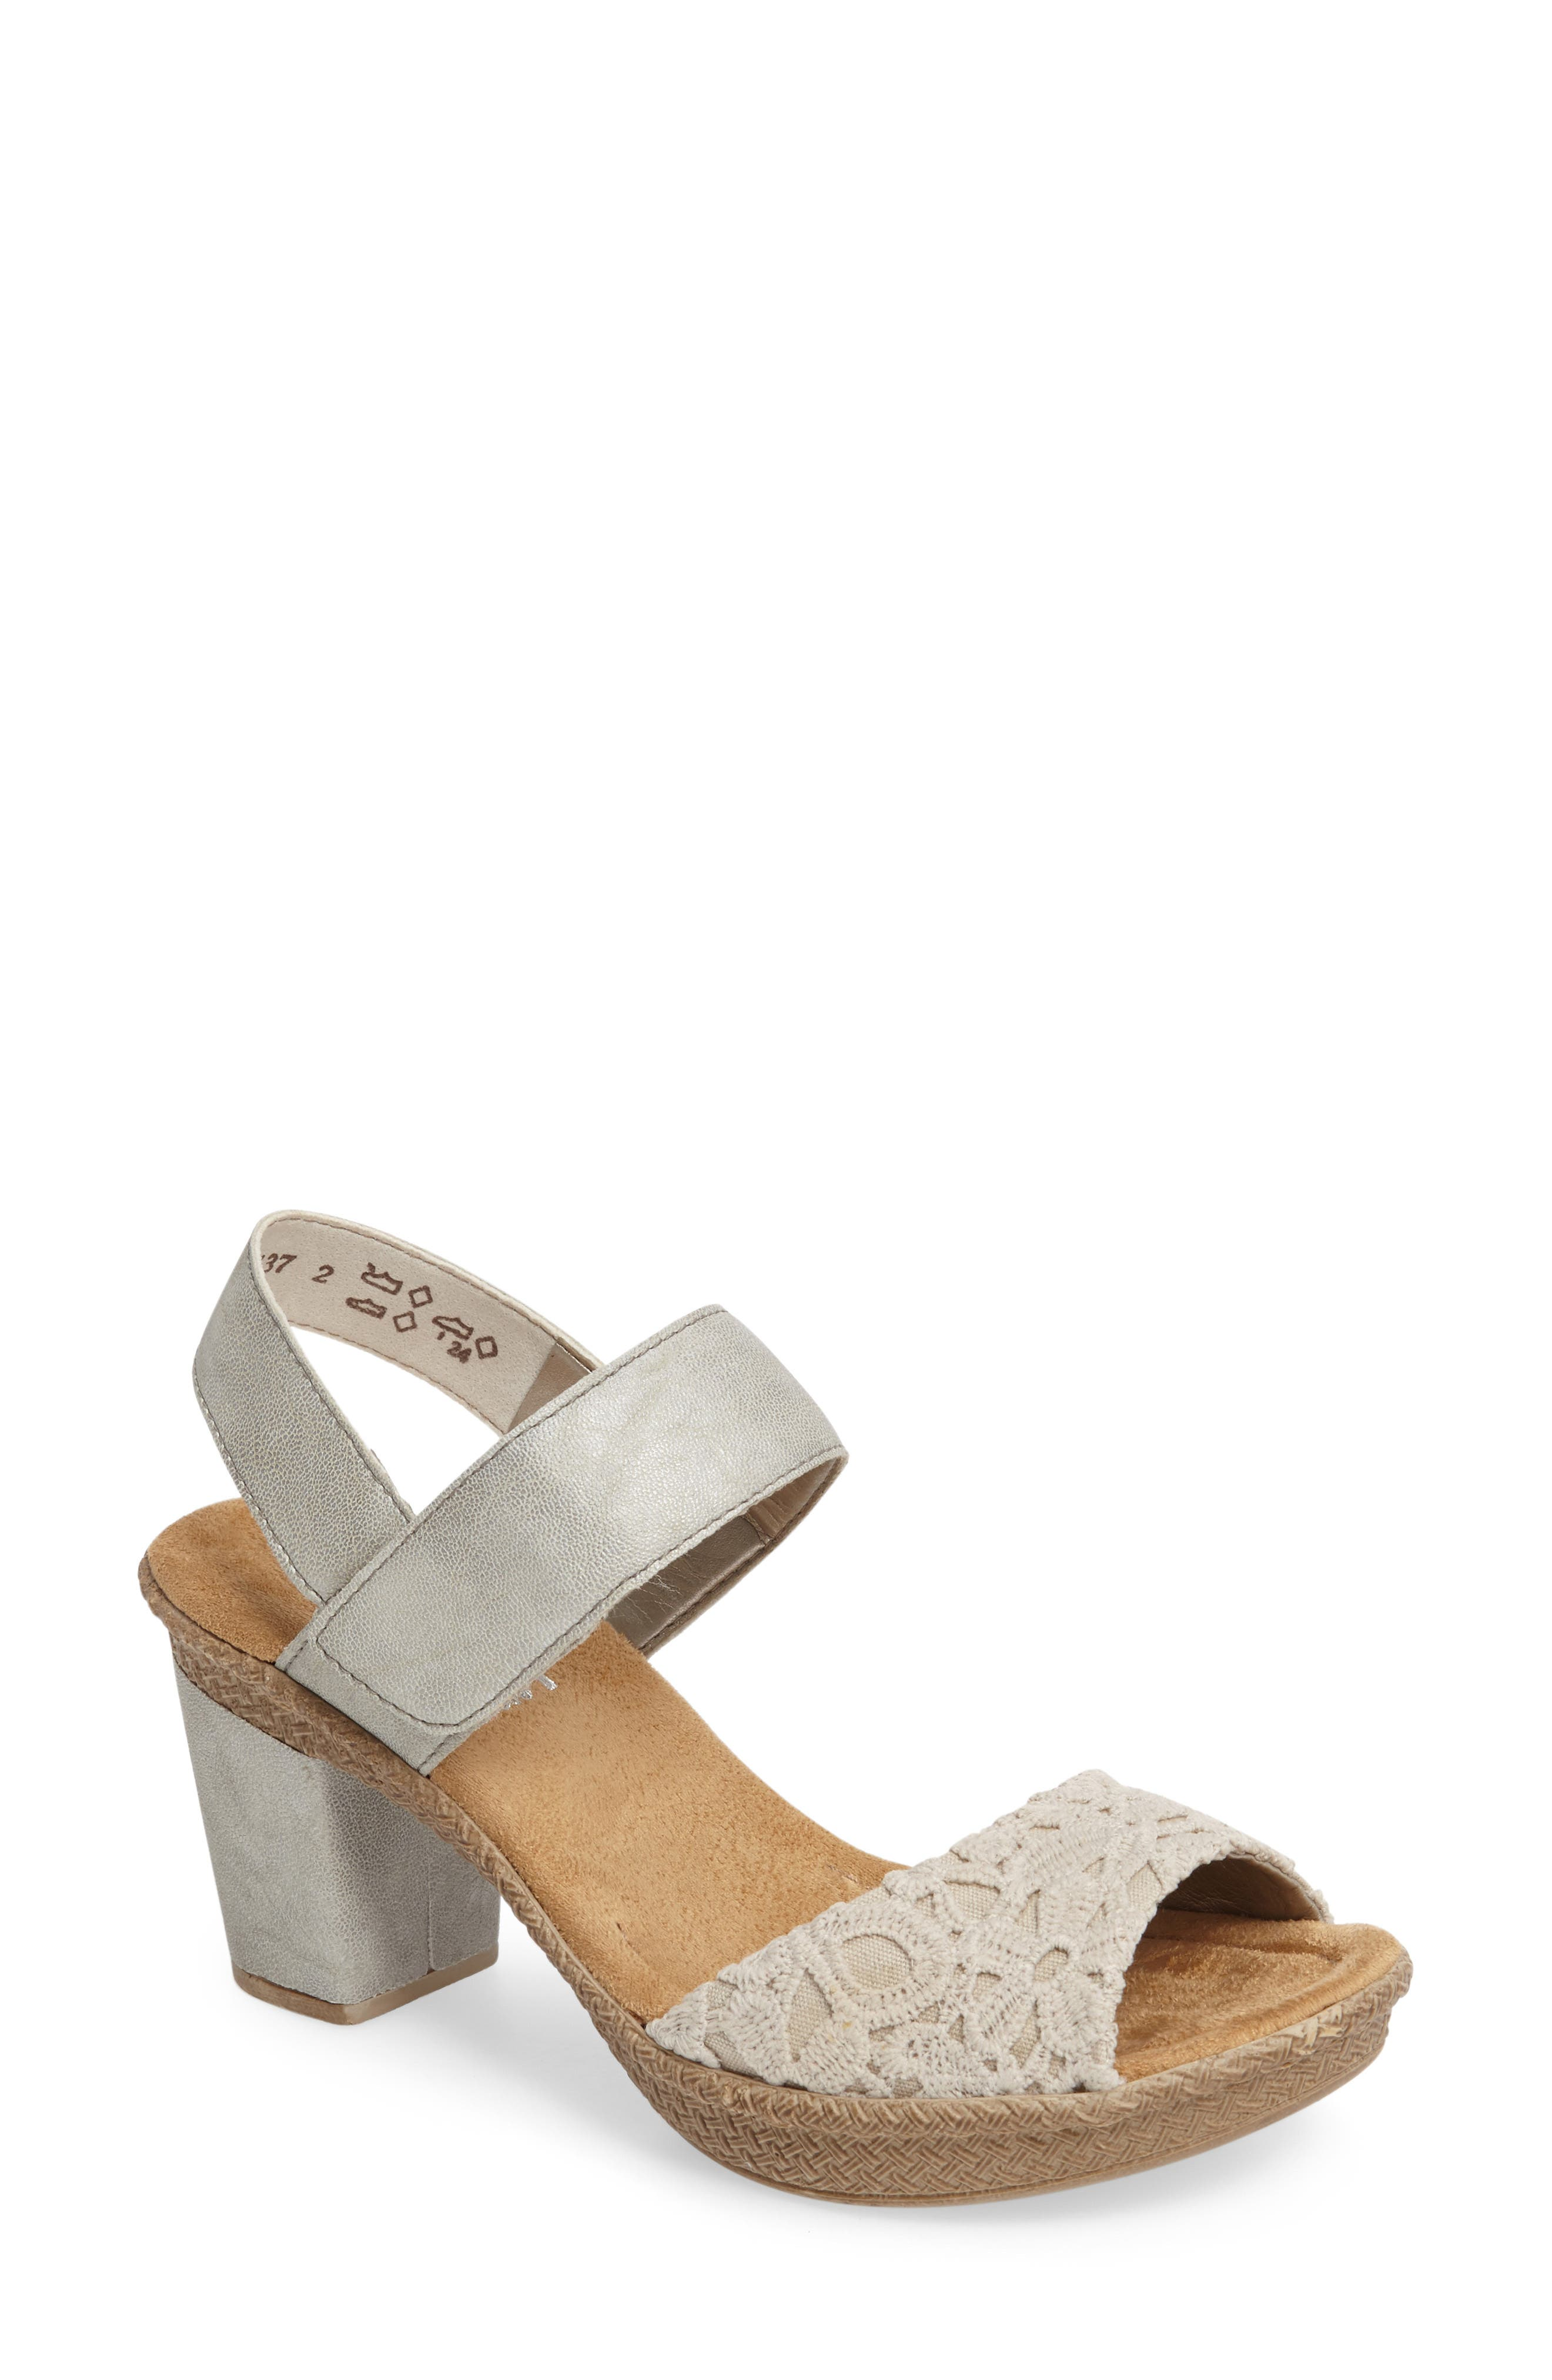 Rabea 61 Sandal,                         Main,                         color, 250